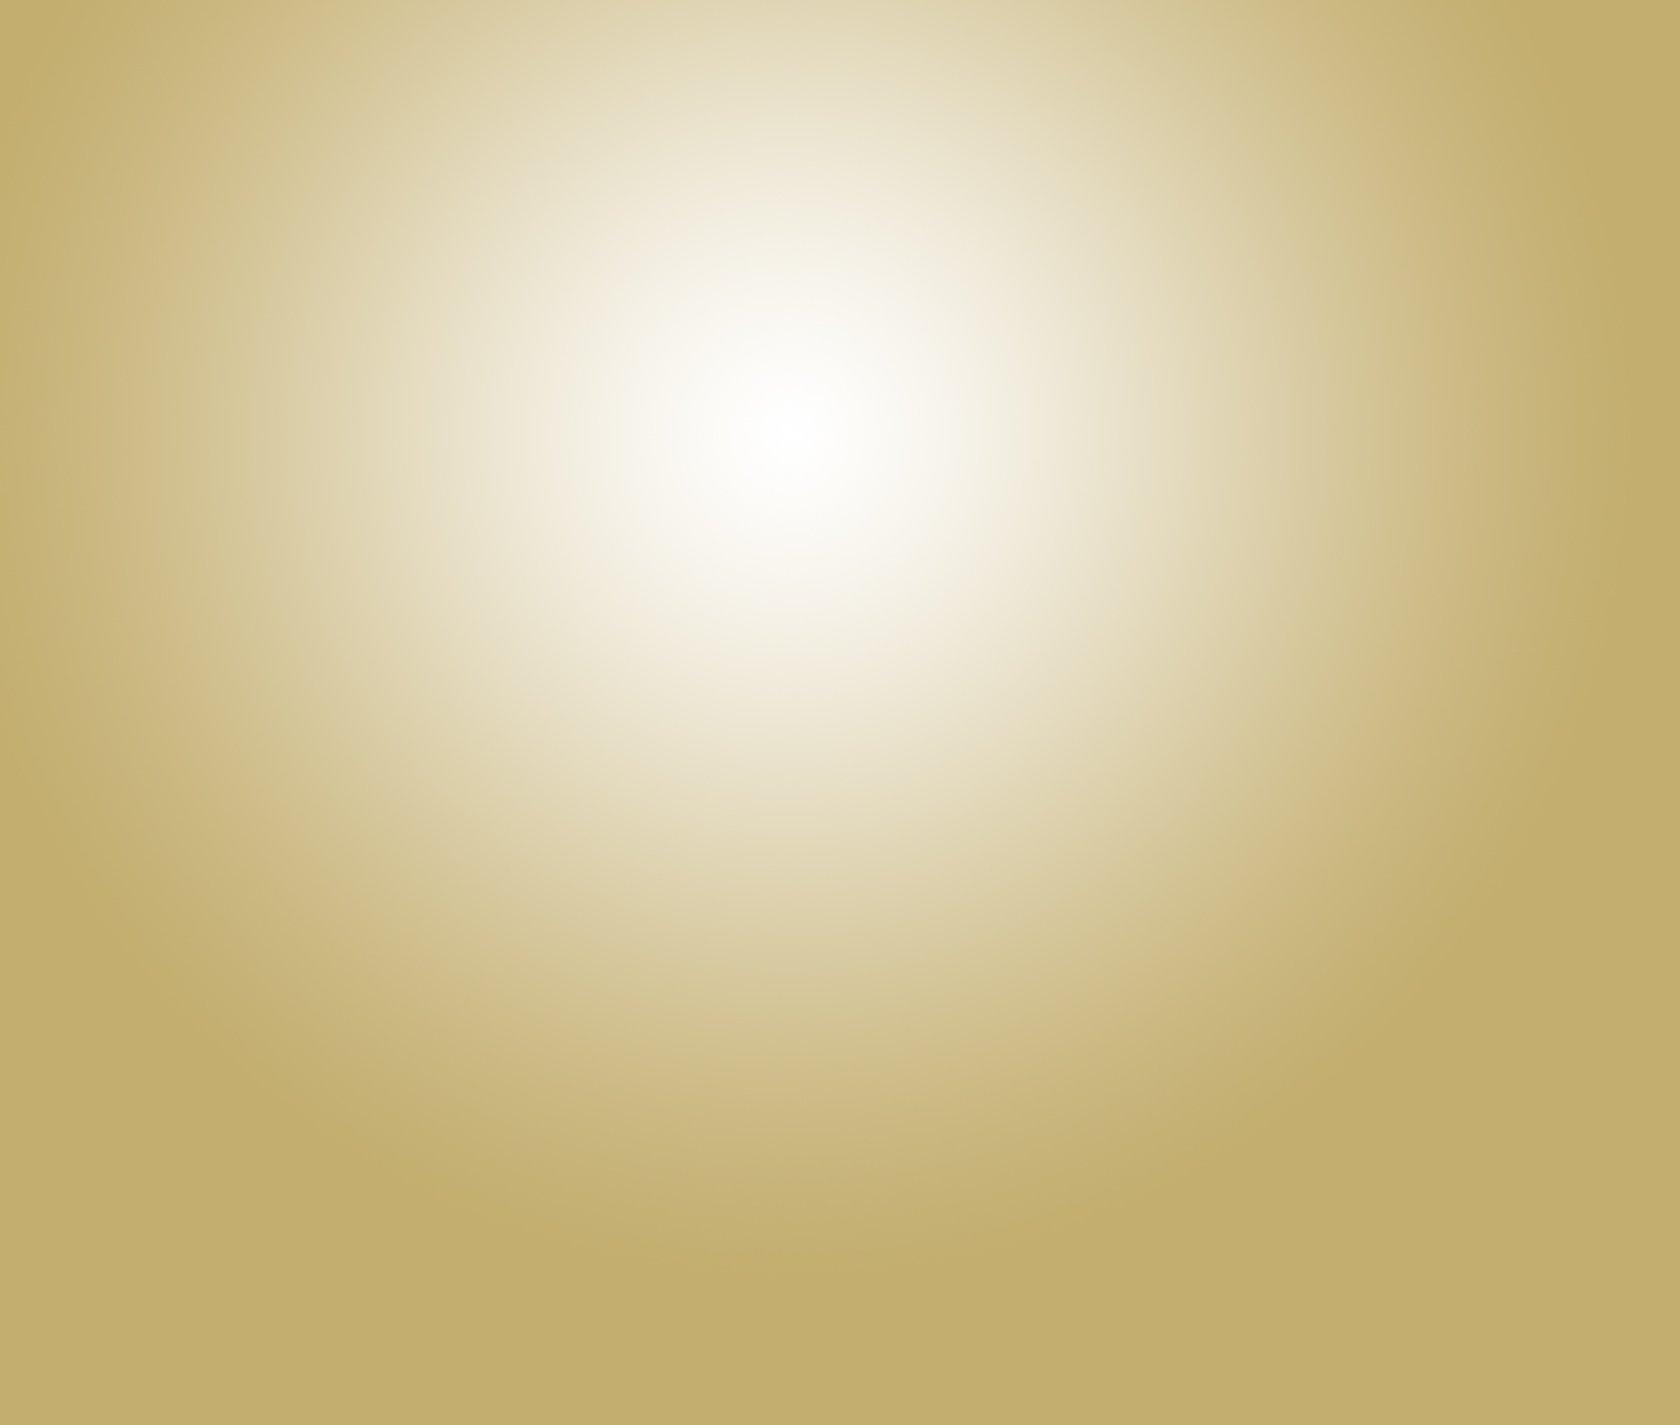 light golden background - photo #17